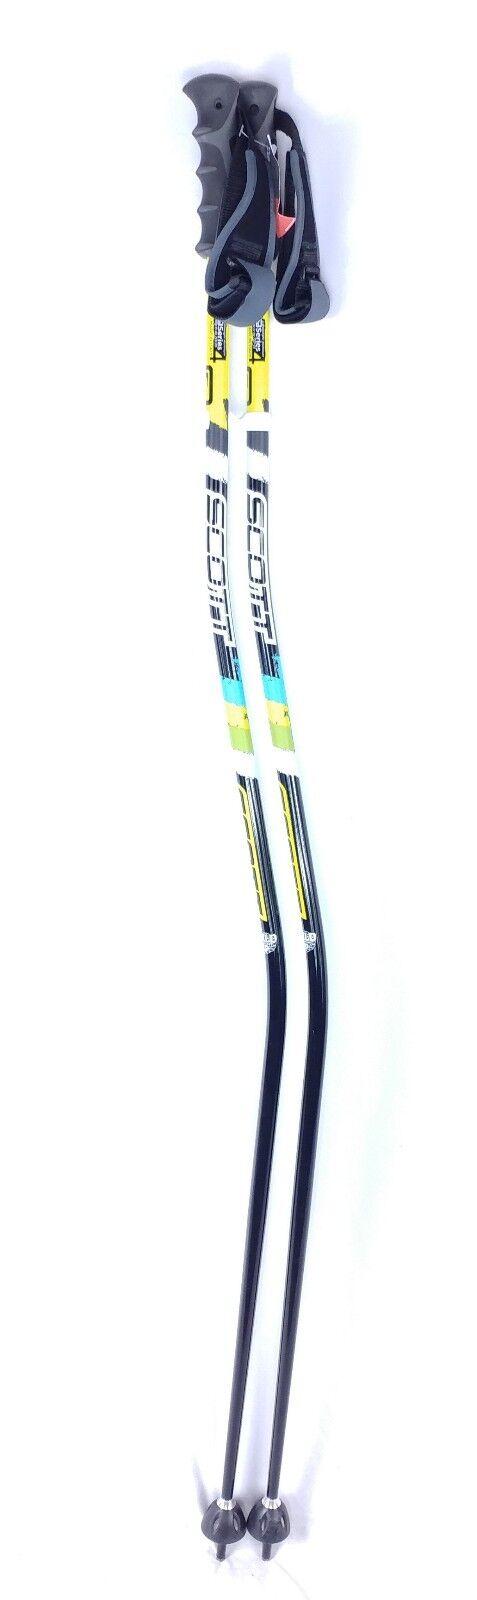 Scott WC GS RACE Bent ski poles sizes 54  inch aluminum w  grip adjust